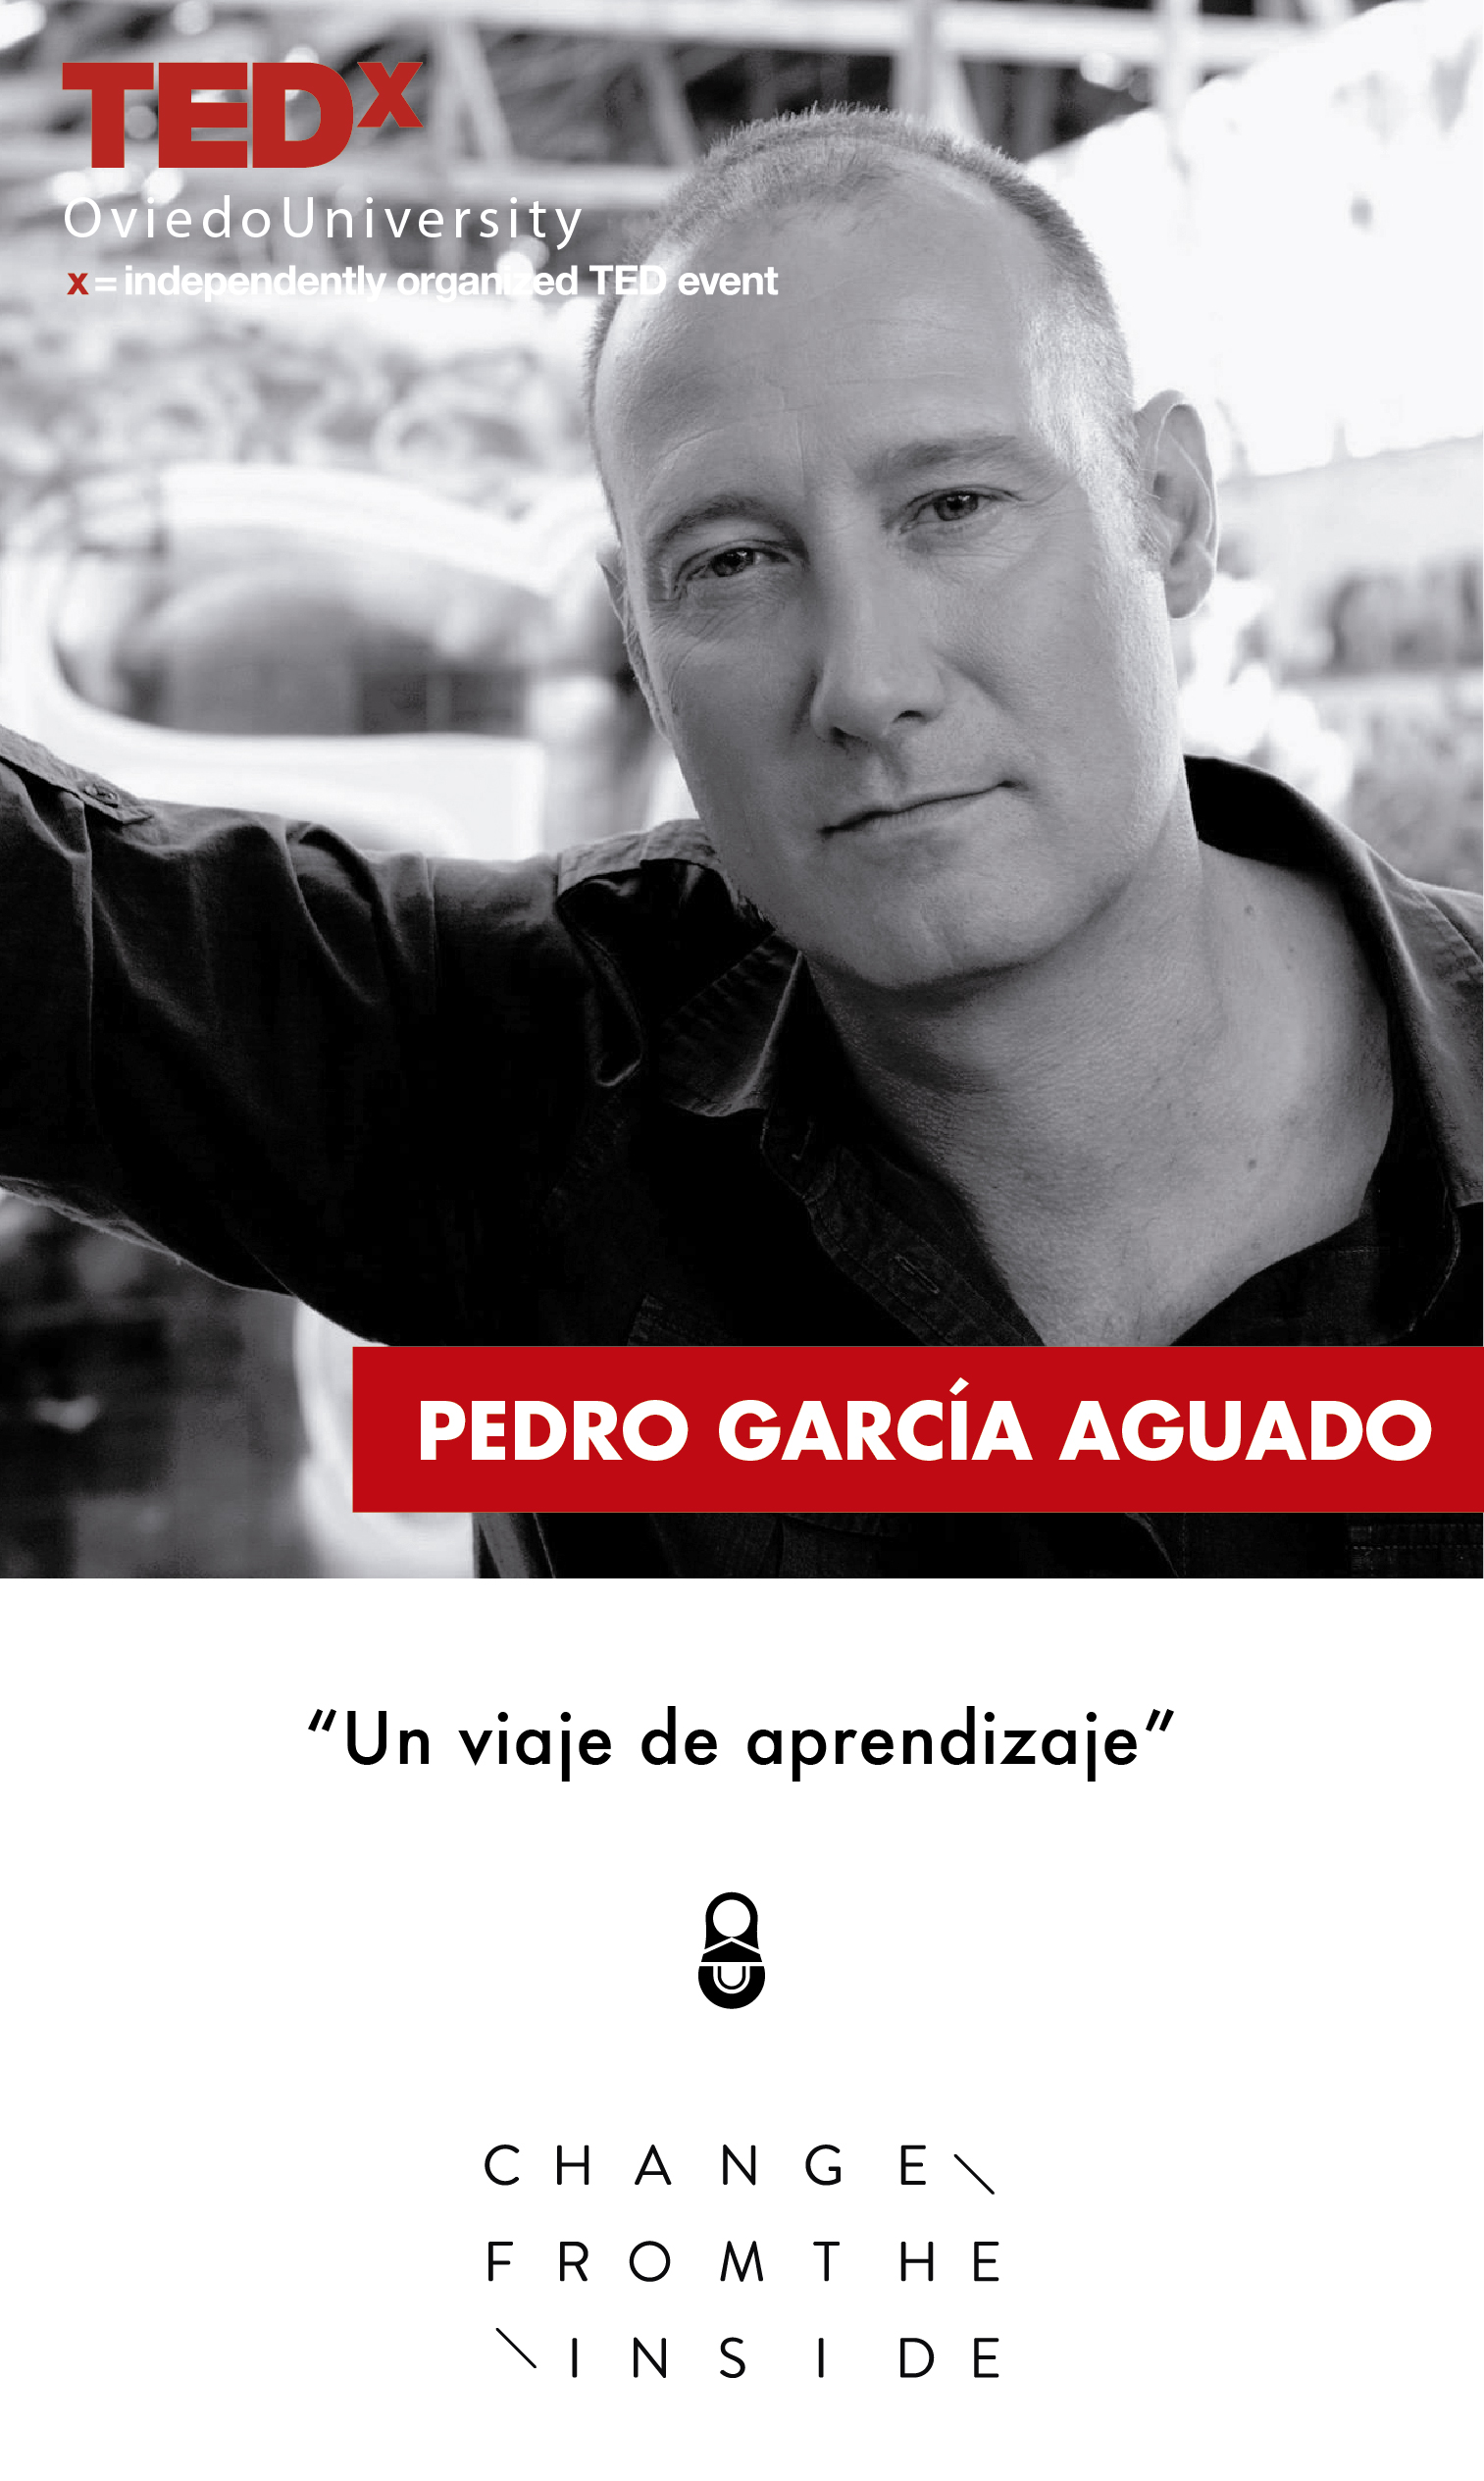 PEDRO GARCIA AGUADO